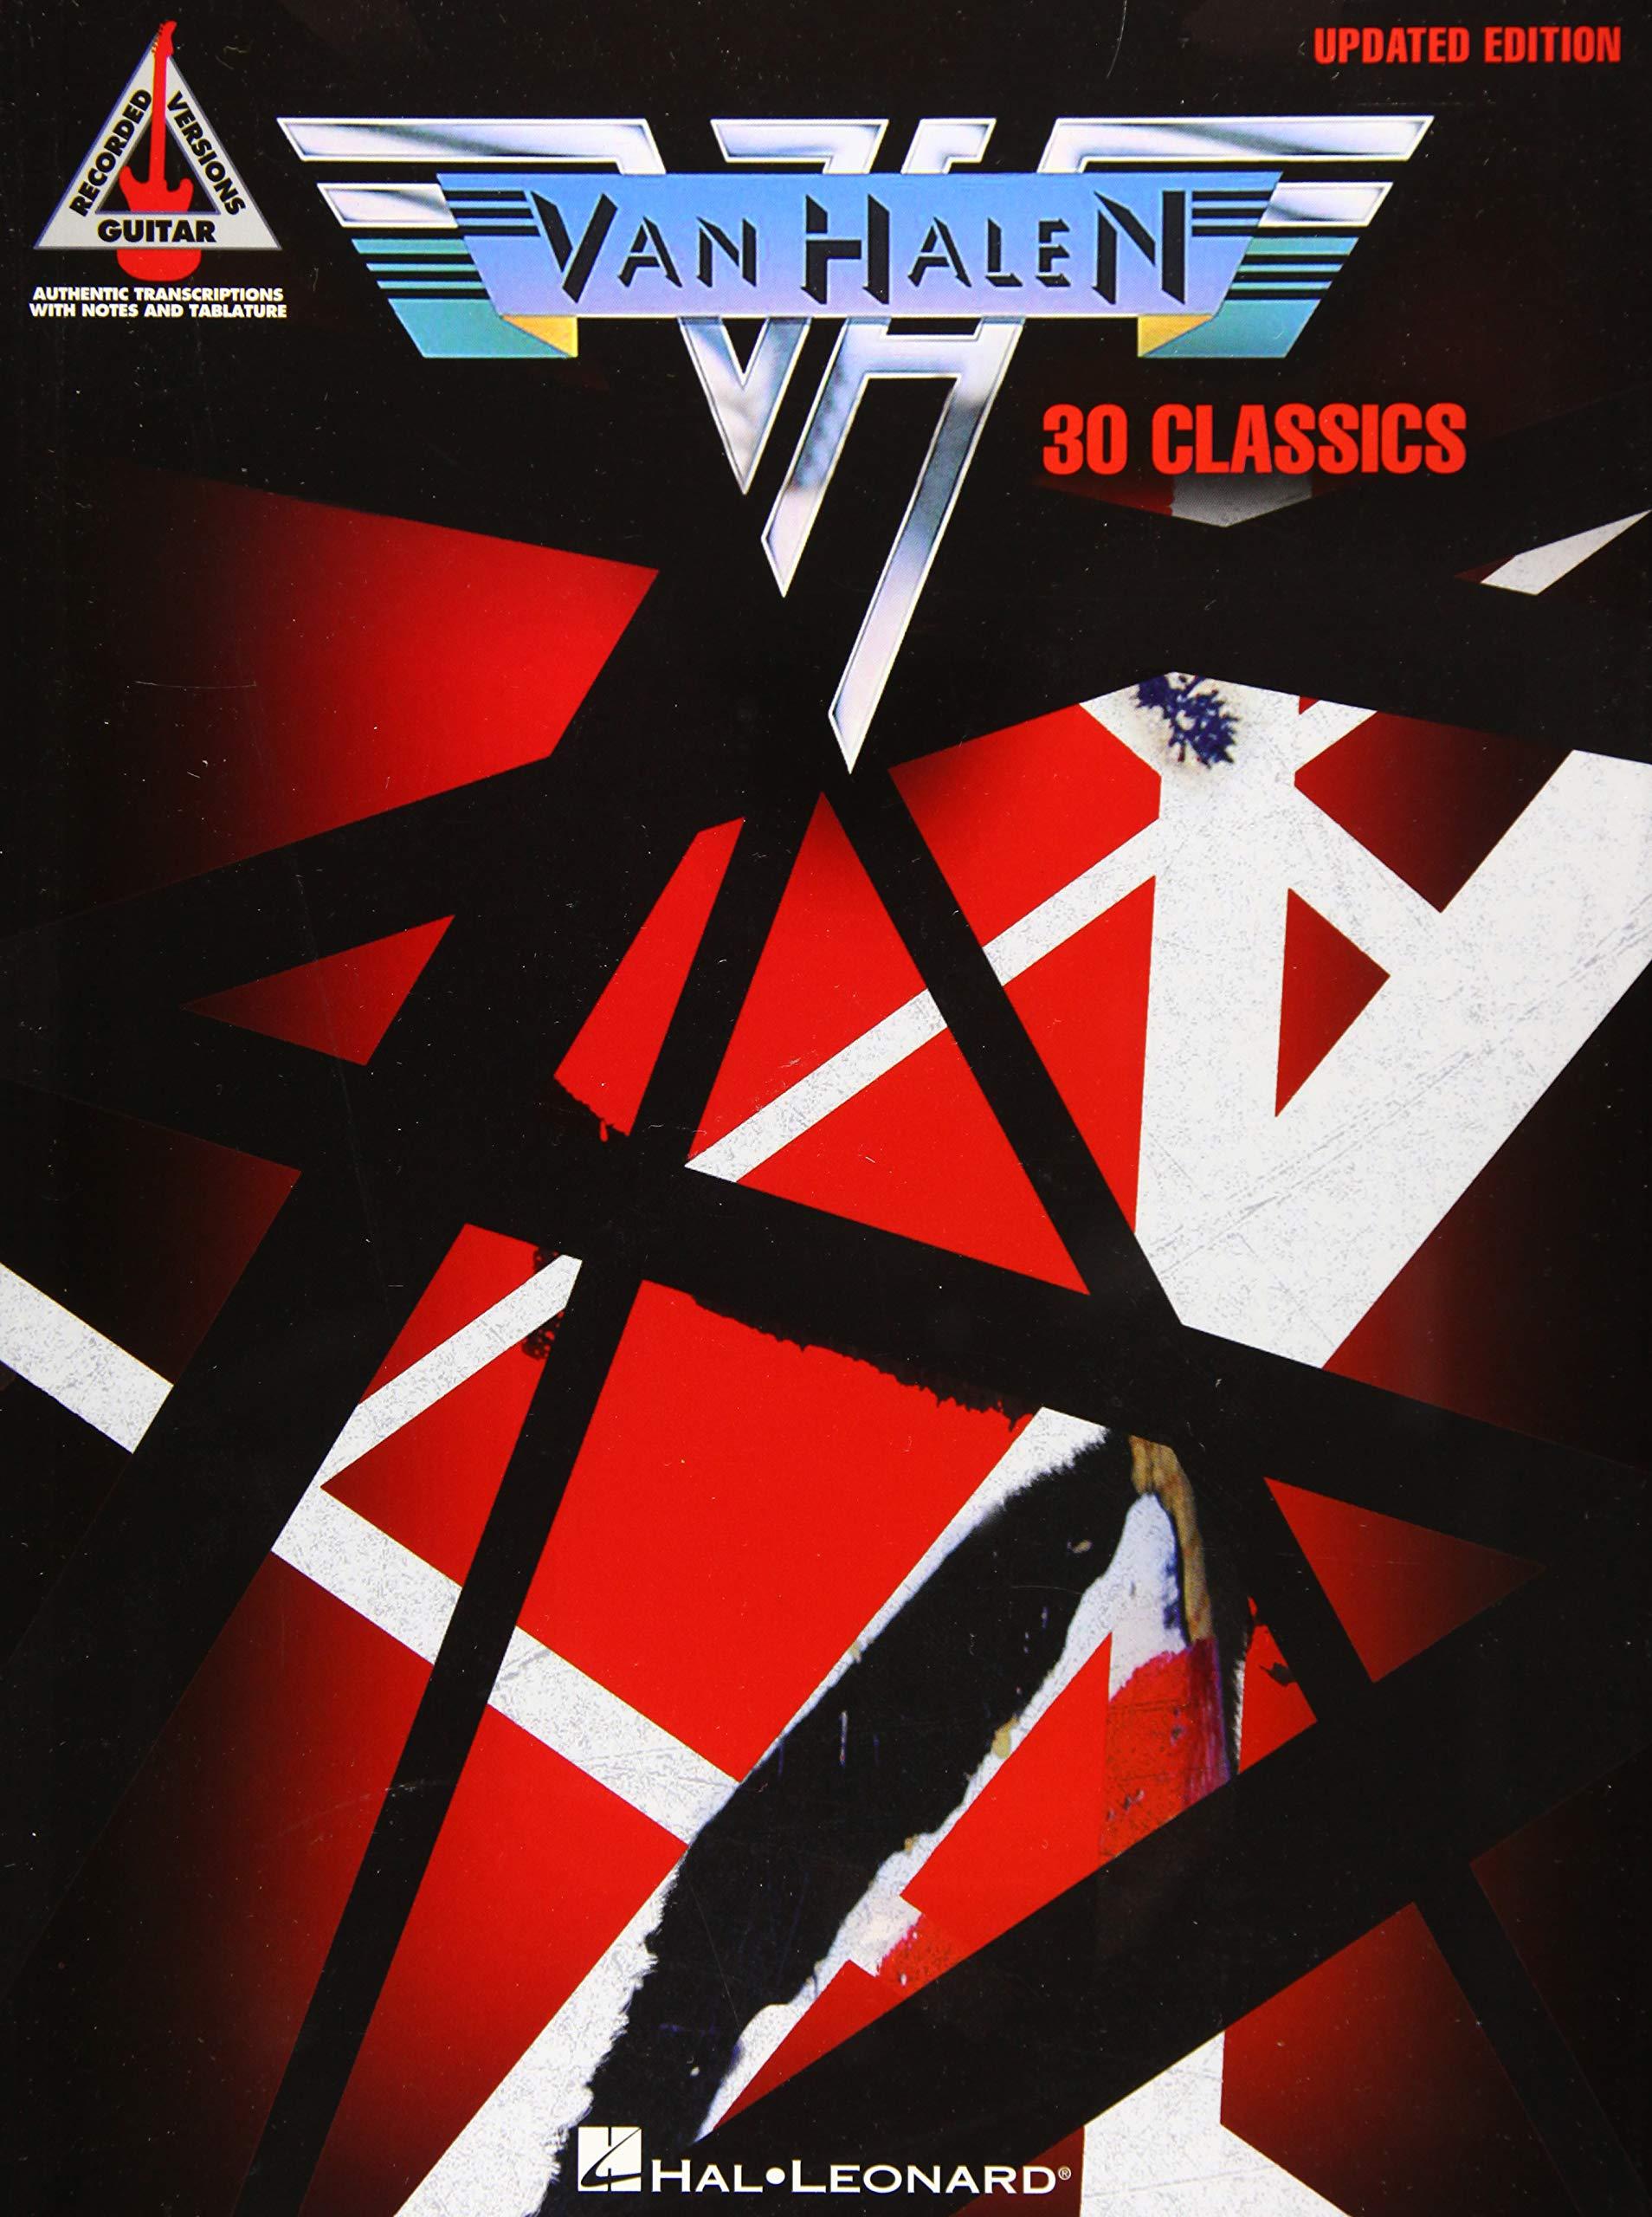 Van Halen - 30 Classics: Updated Edition Guitar Recorded Versions ...